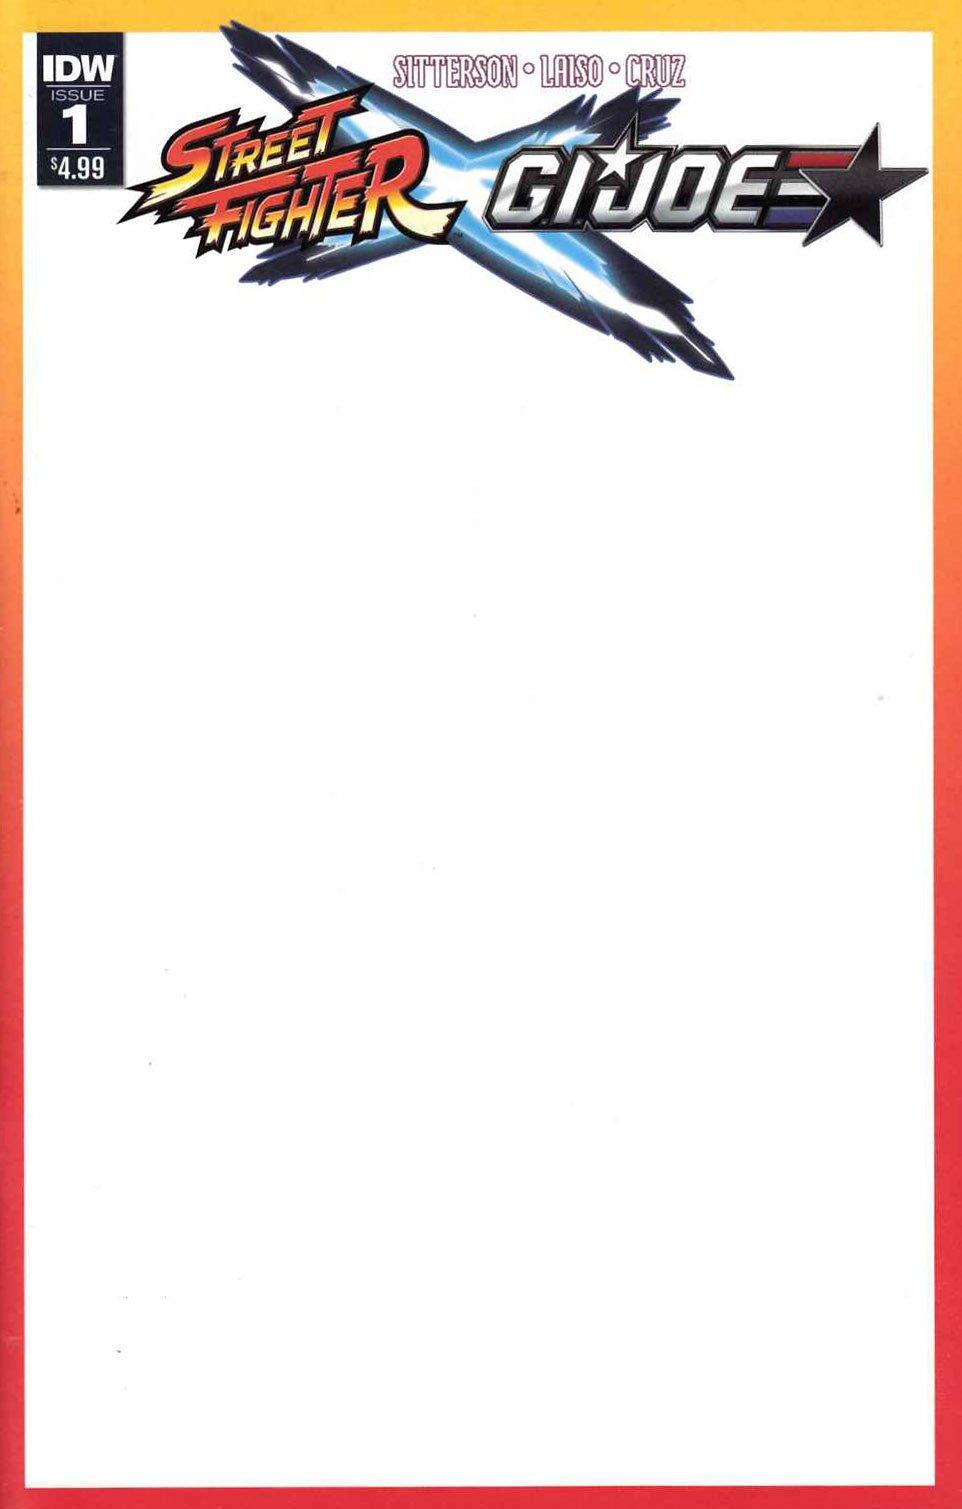 Street Fighter X G.I. JOE 001 (February 2016) (sketch cover)